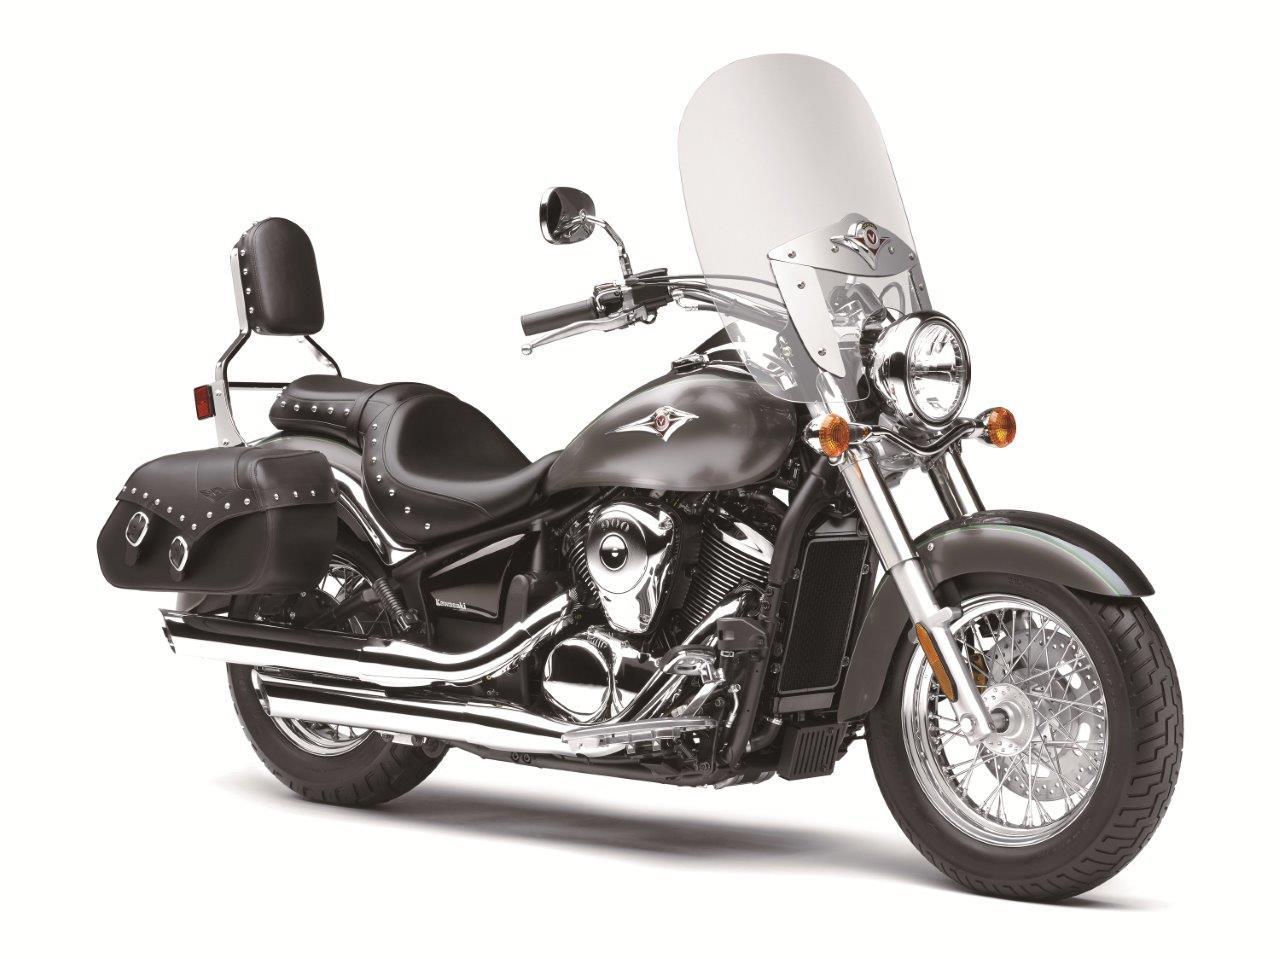 2020 Kawasaki Vulcan 900 Classic